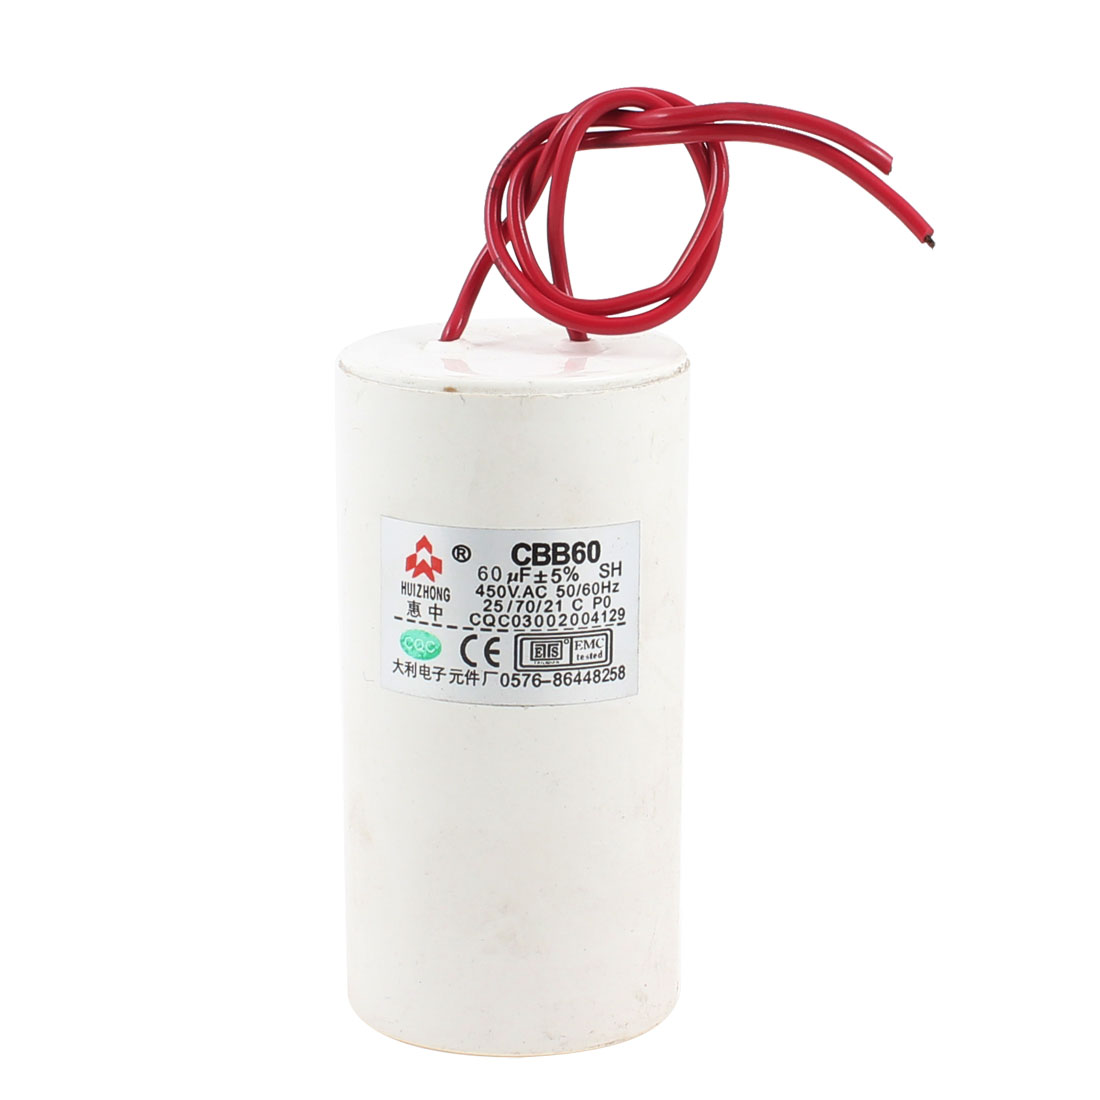 CBB60 AC 450V 60uF Cylindrical Non Polar Motor Capacitor White